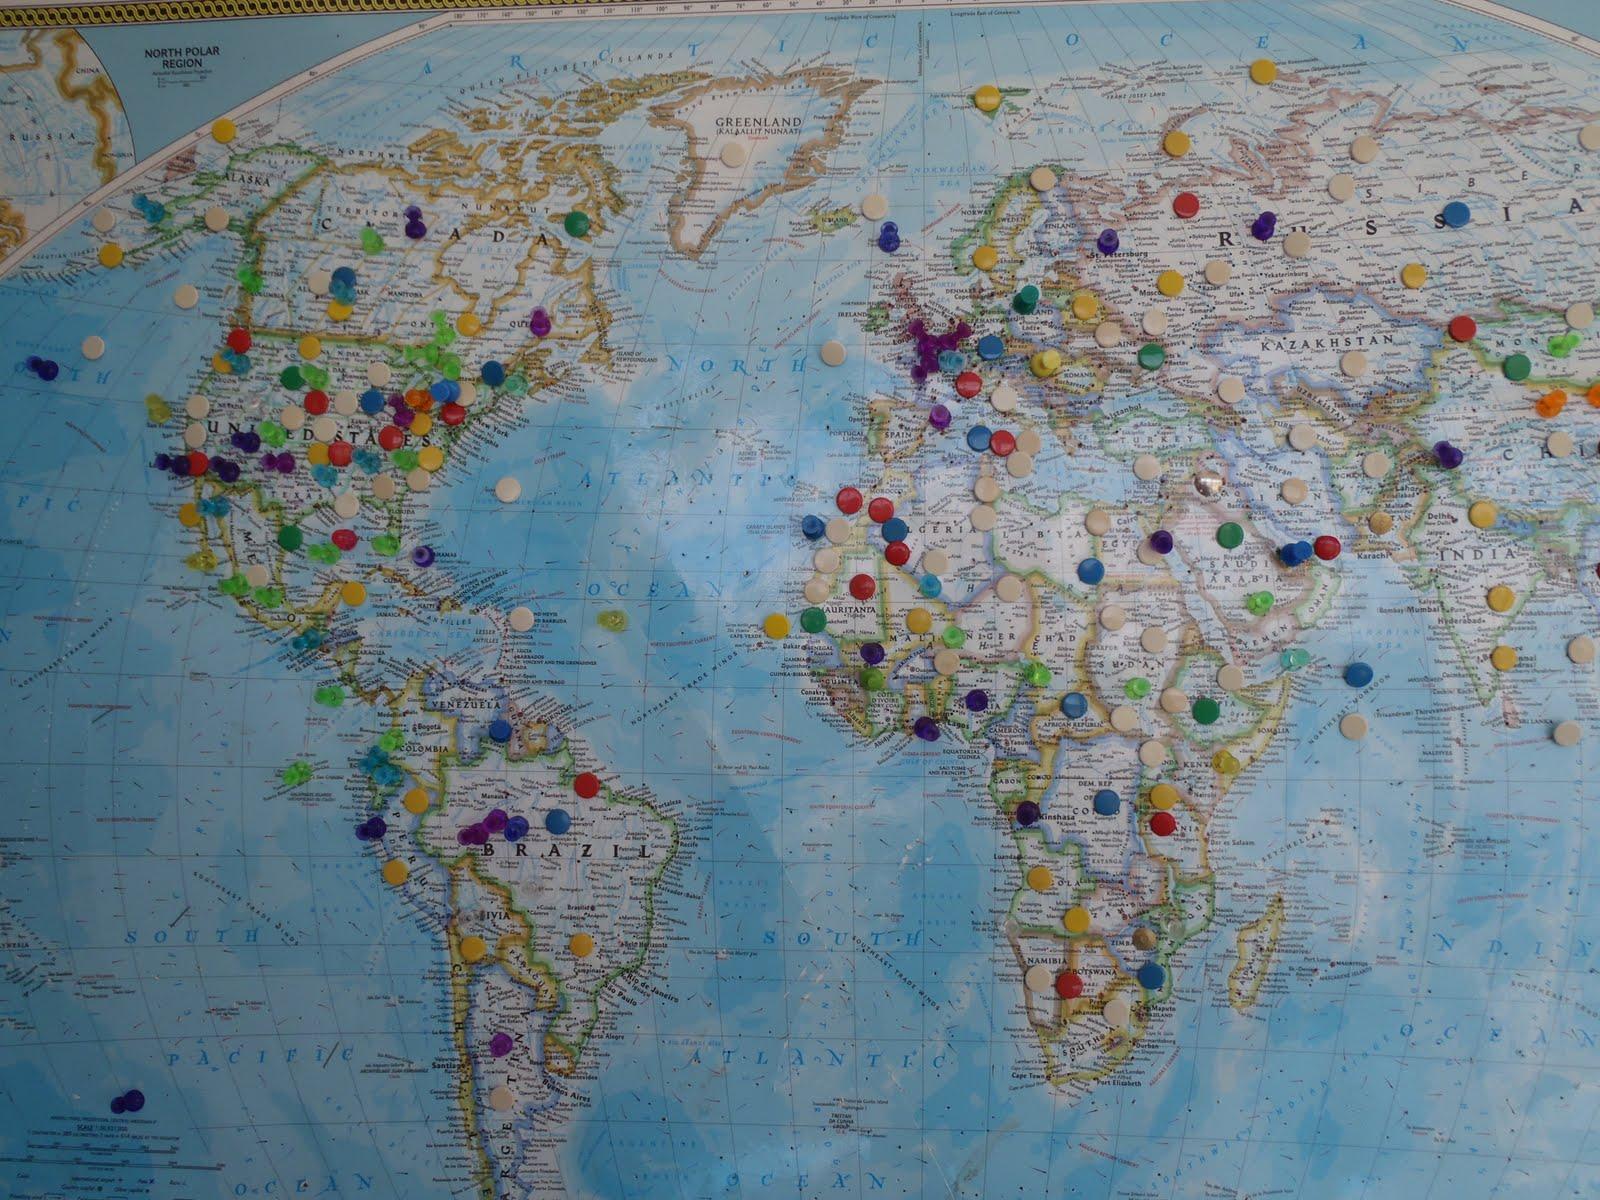 Scenic BiteWays – Where Have I Traveled Map